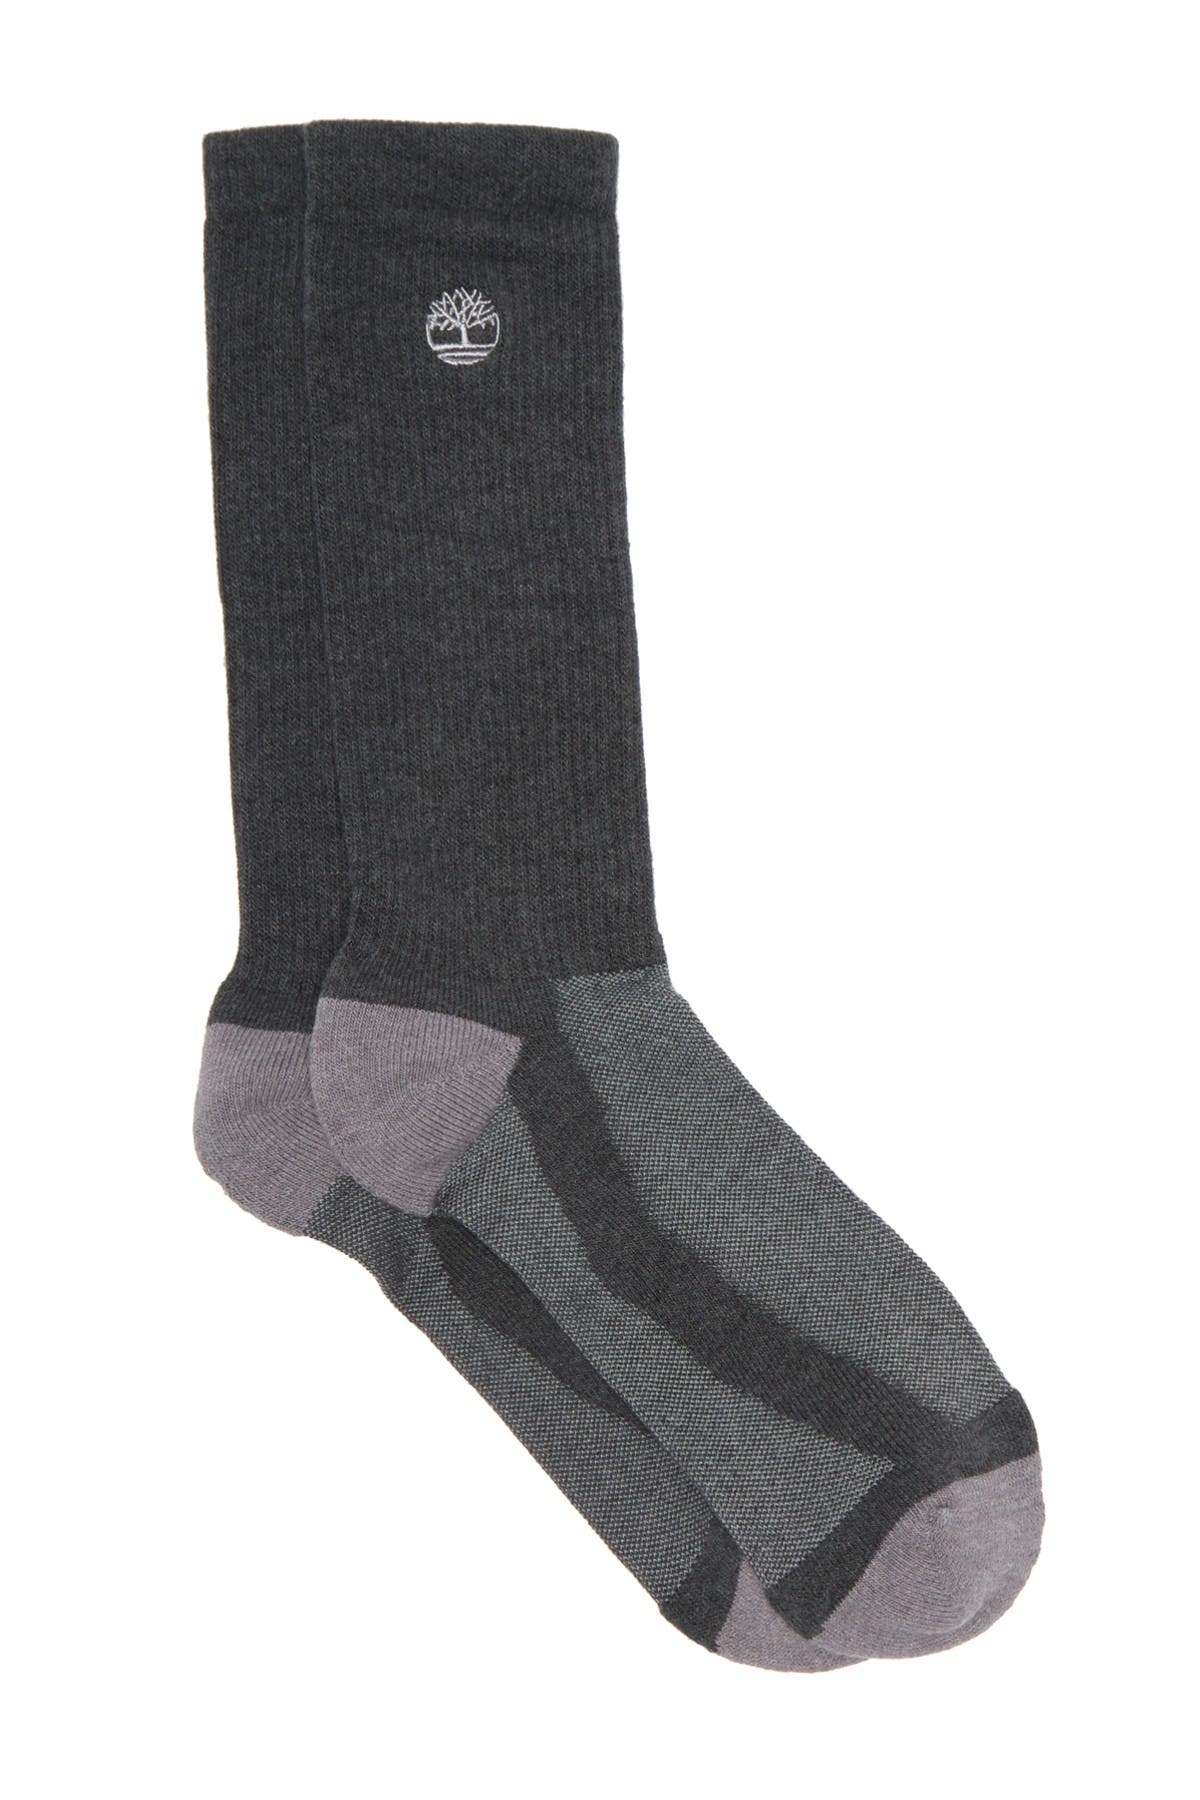 Image of Timberland CoolMax Crew Socks - Pack of 2